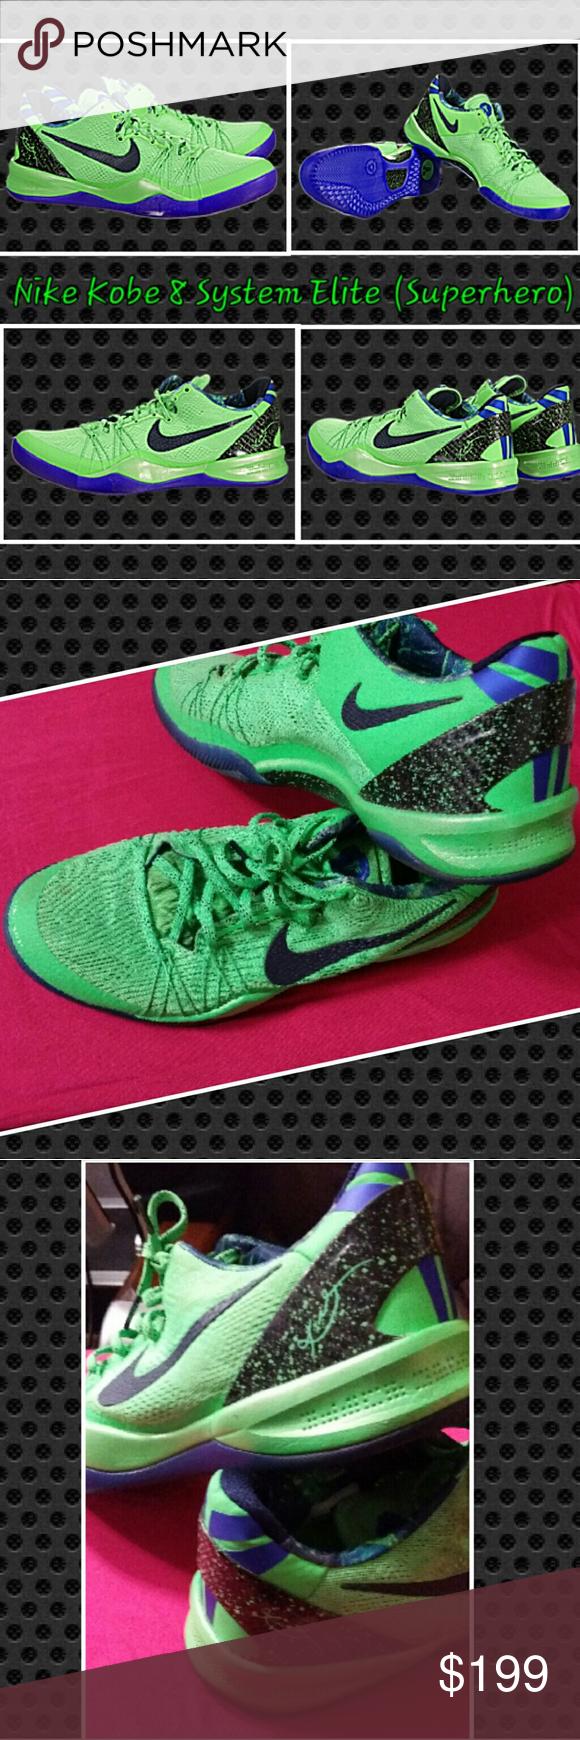 check out 10fb8 79bd6 Nike Kobe 8 System Elite (Superhero) 586156-300 2013 Nike Kobe Bryant